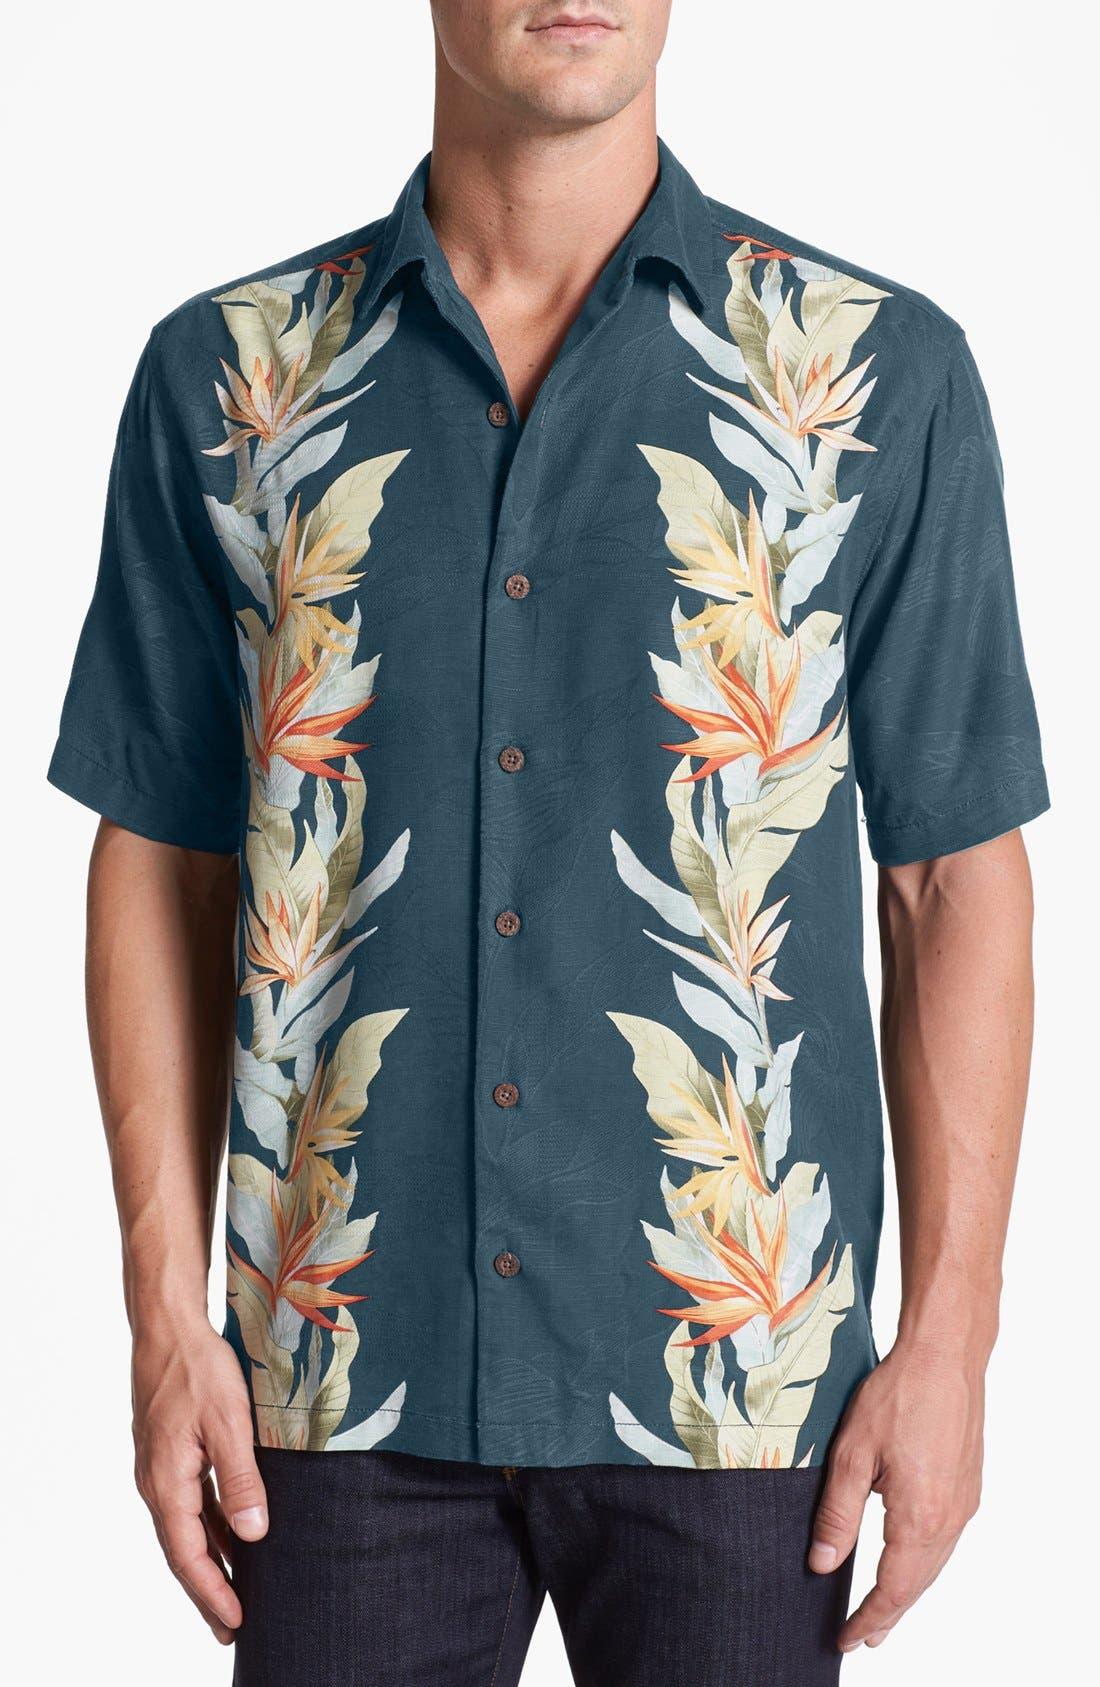 Main Image - Tommy Bahama 'Tropic of Parallel' Campshirt (Big & Tall)